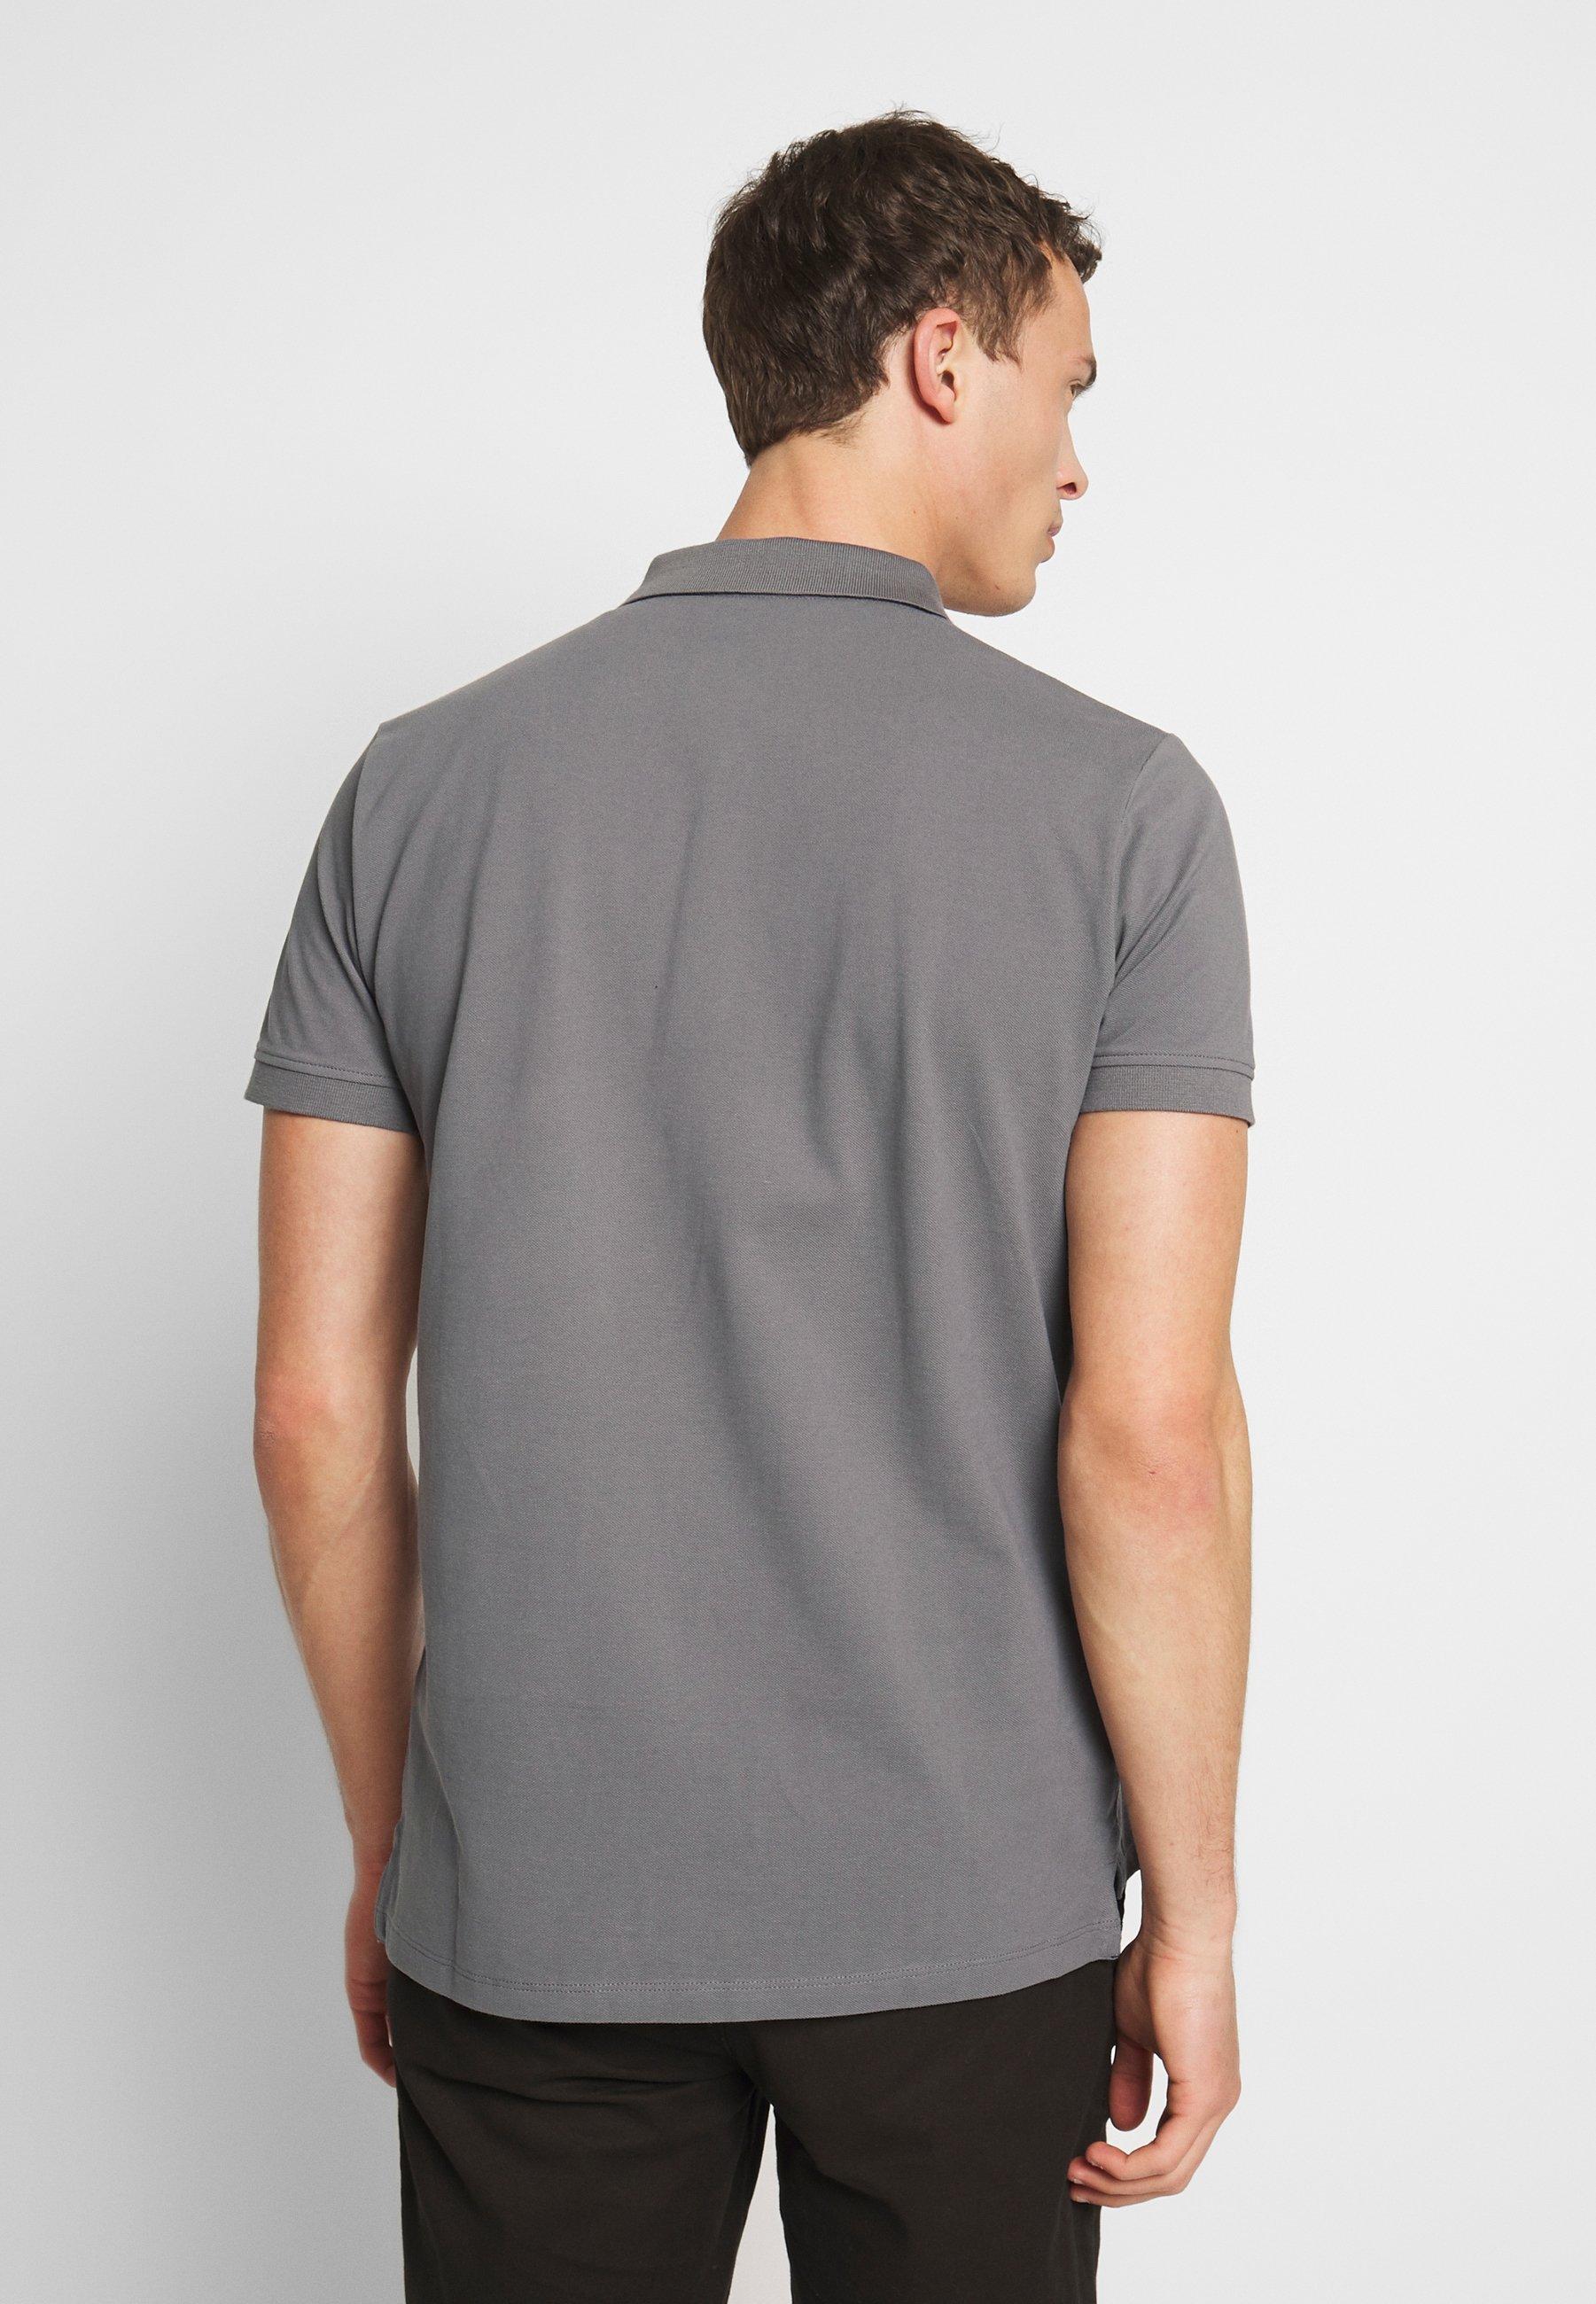 Esprit OCS  - Polo shirt - dark grey XG6my